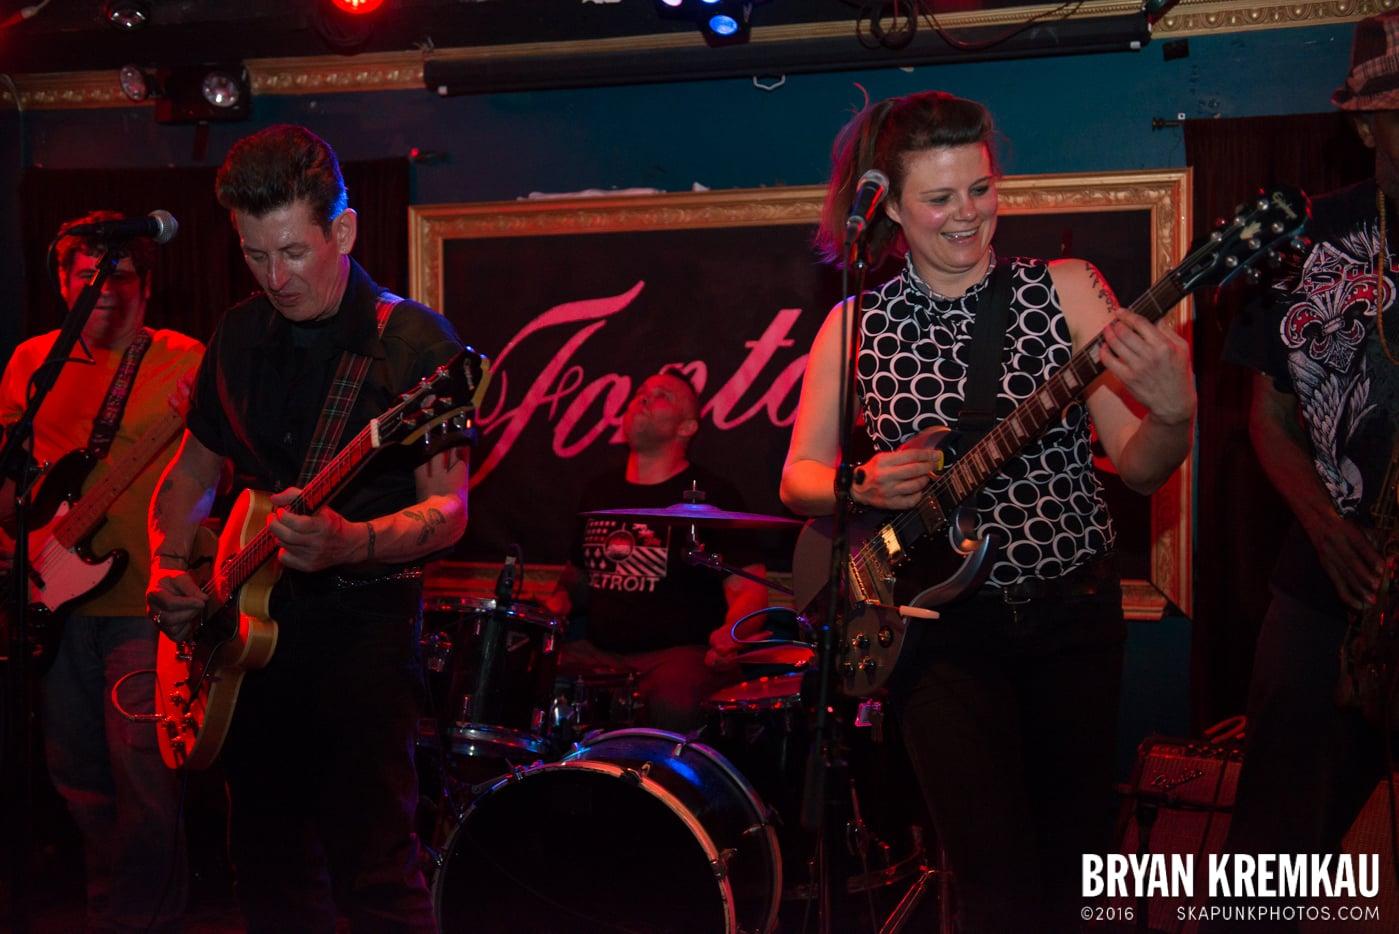 Roddy Radiation & The Scotch Bonnets @ Fontana's, NYC - 4.25.15 (4)